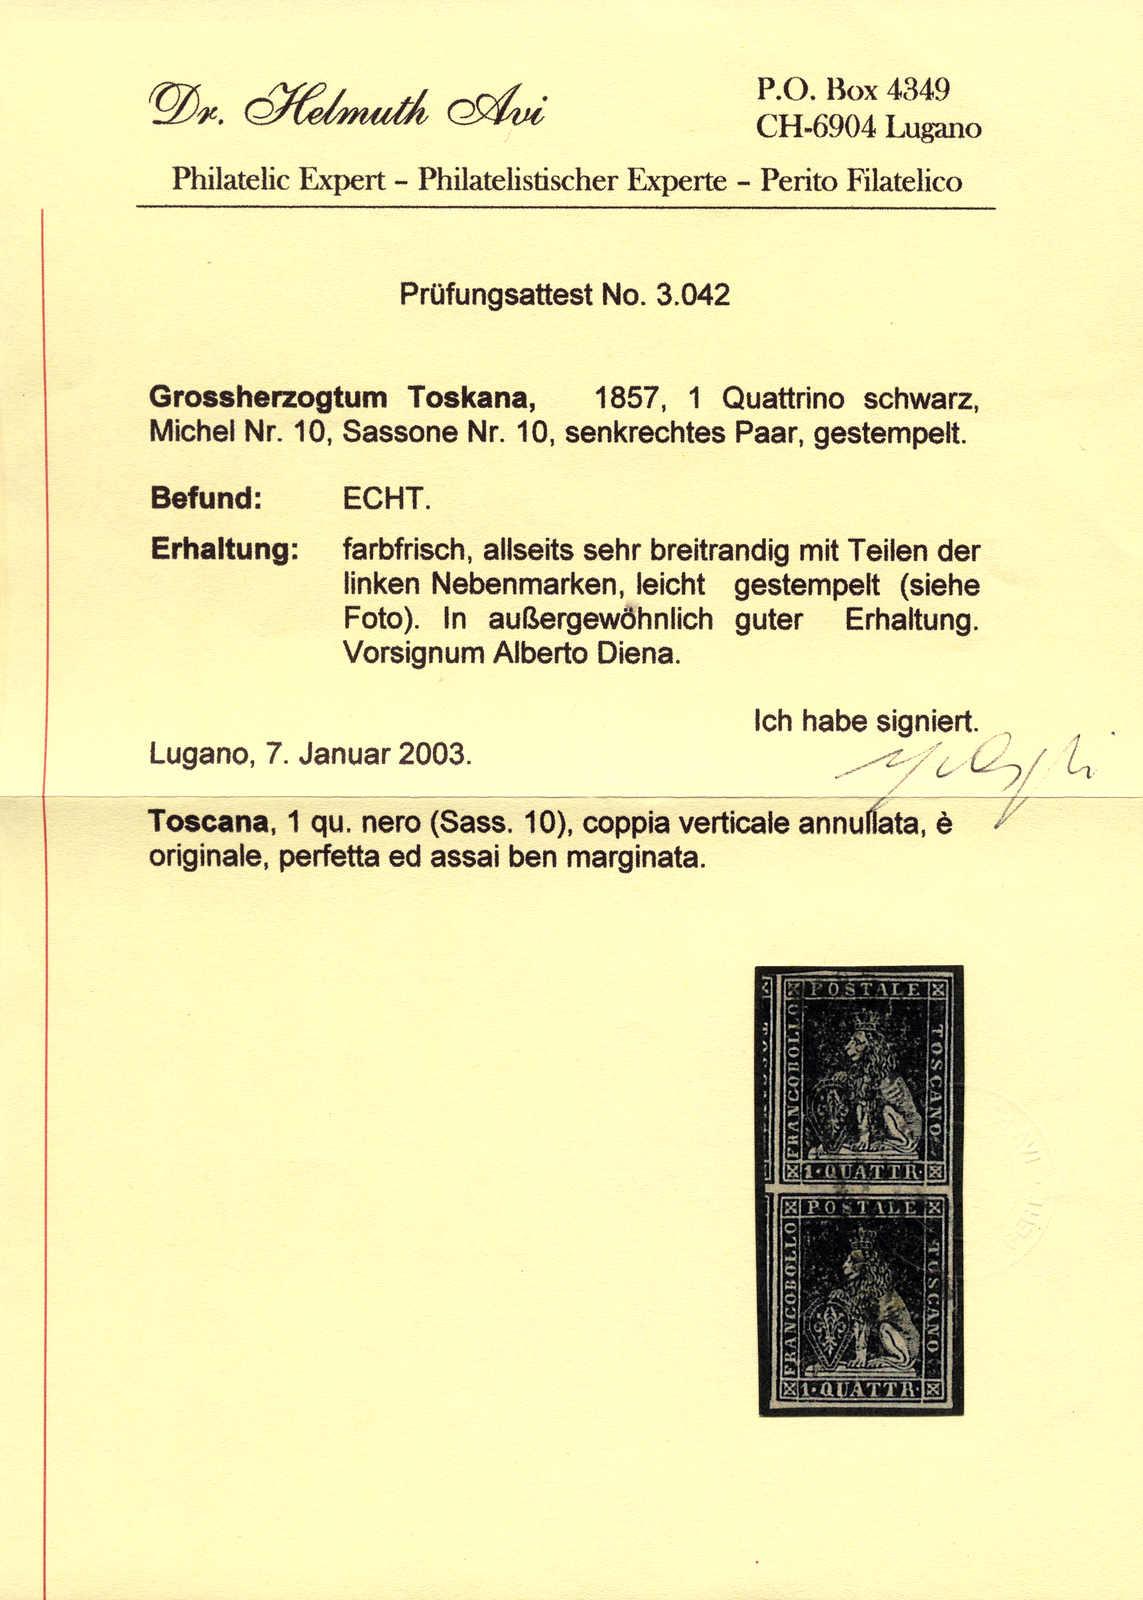 Lot 10081 - europe tuscany -  classicphil GmbH 3 rd classicphil Auction - VIENNA- AUSTRIA